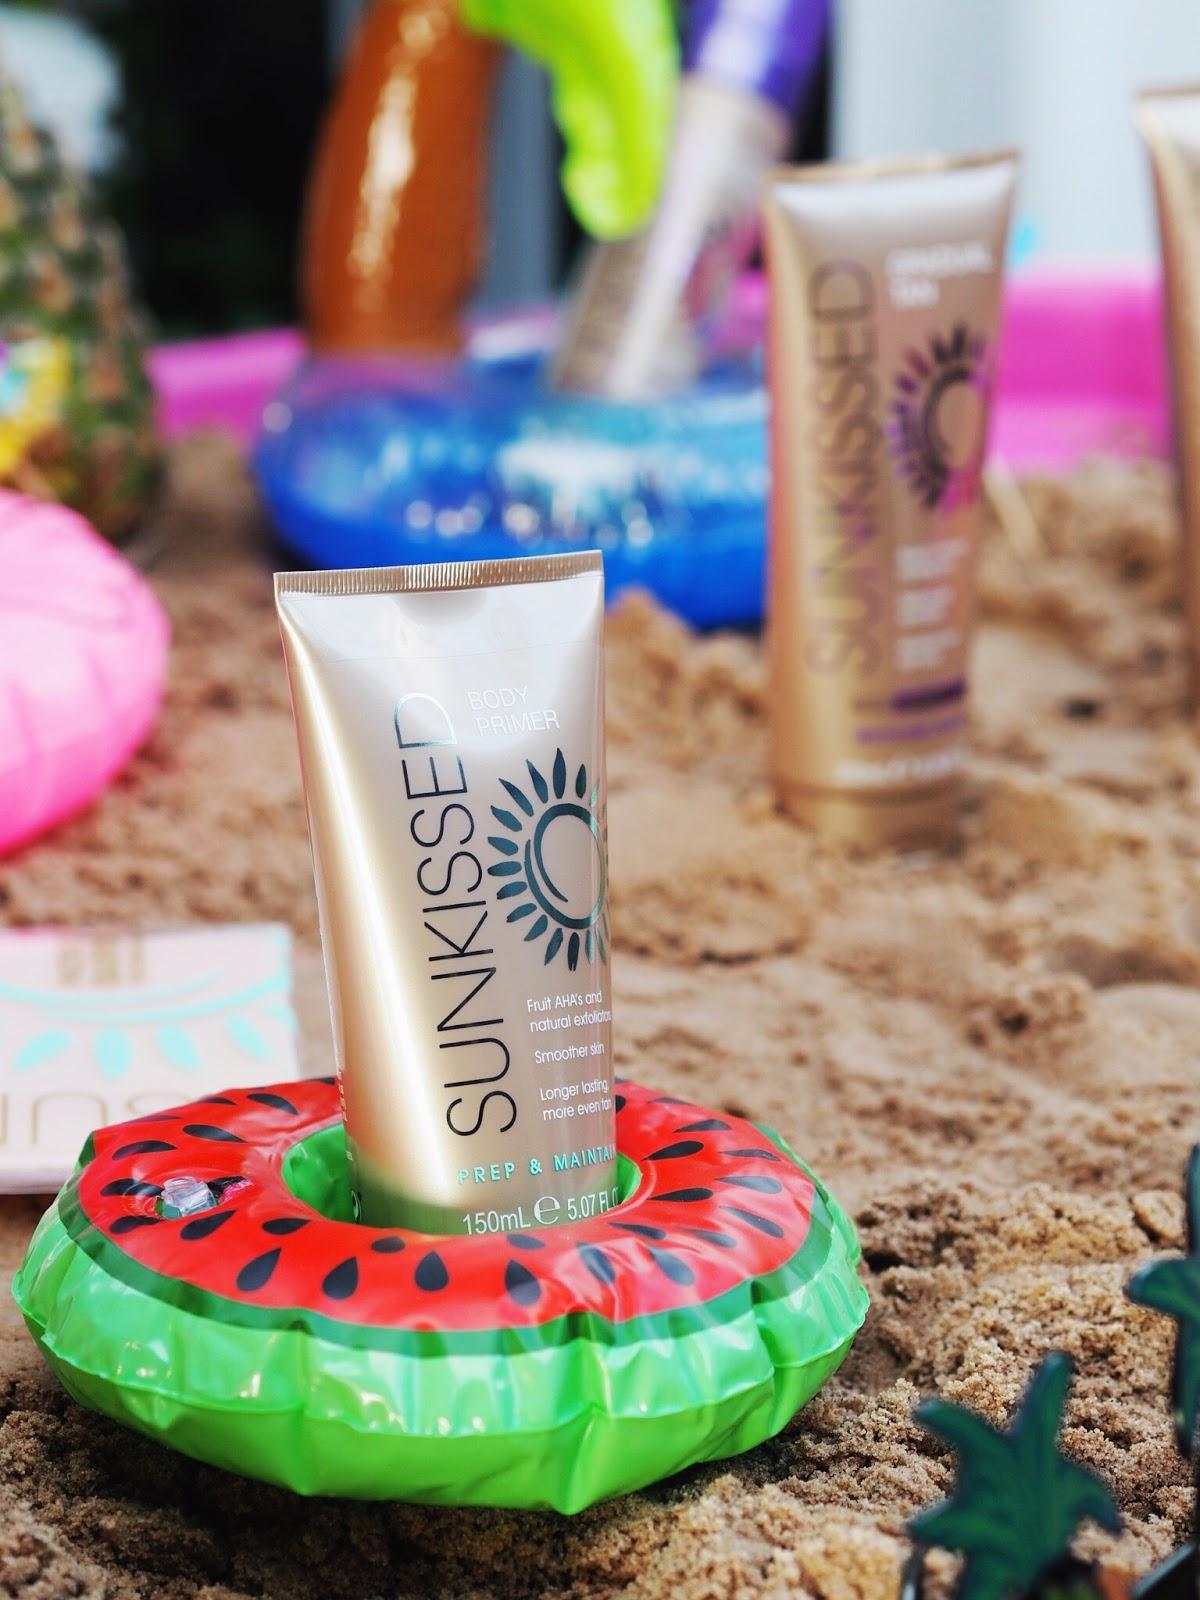 sunkissed fake tan prep and maintain fake tan body primer affordable good self tan superdrug